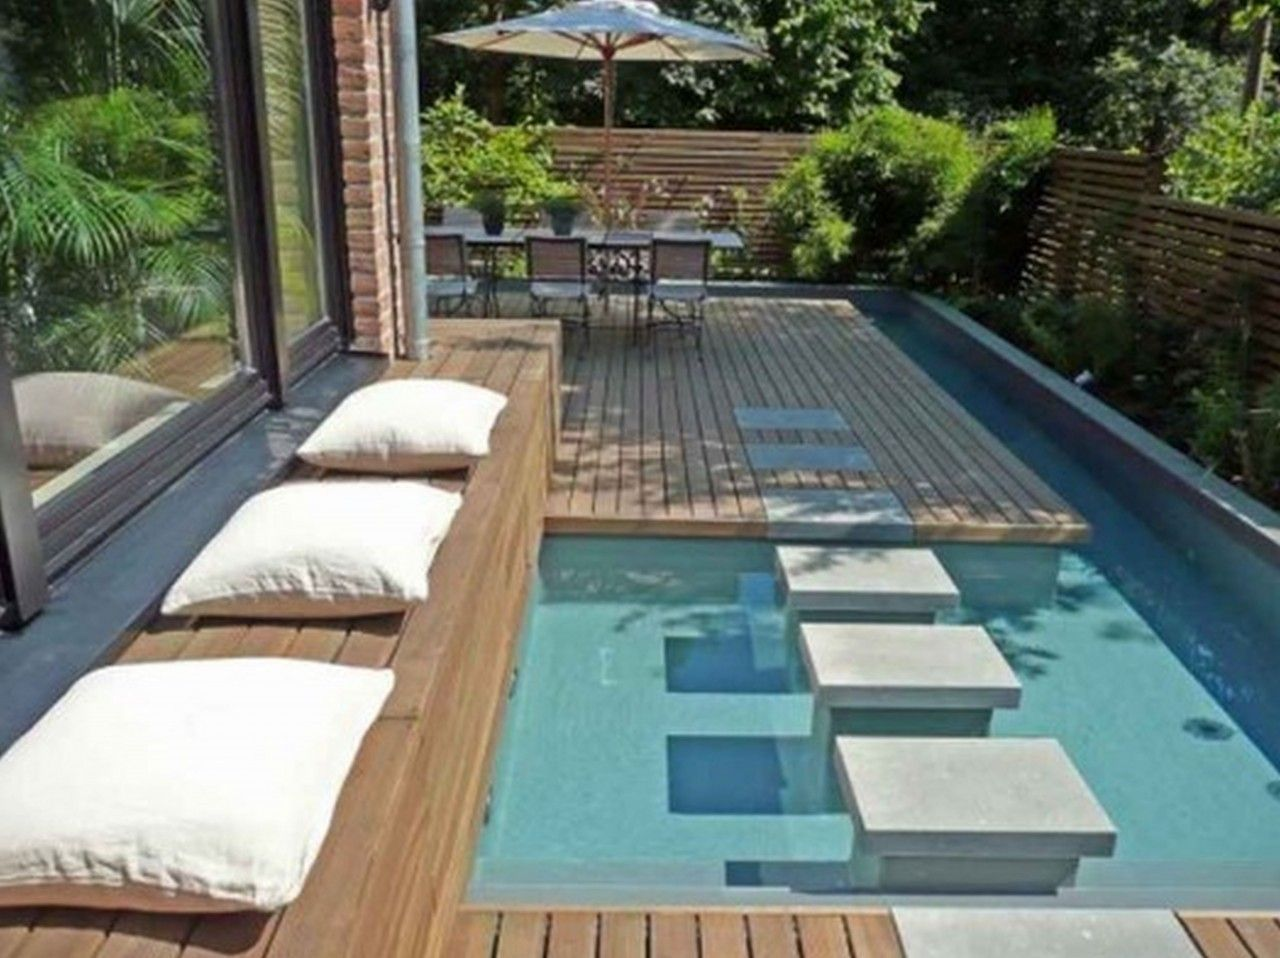 35 Small Backyard Swimming Pool Designs Ideas You Ll Love Homelovers Small Backyard Pools Modern Landscape Design Backyard Landscaping Designs